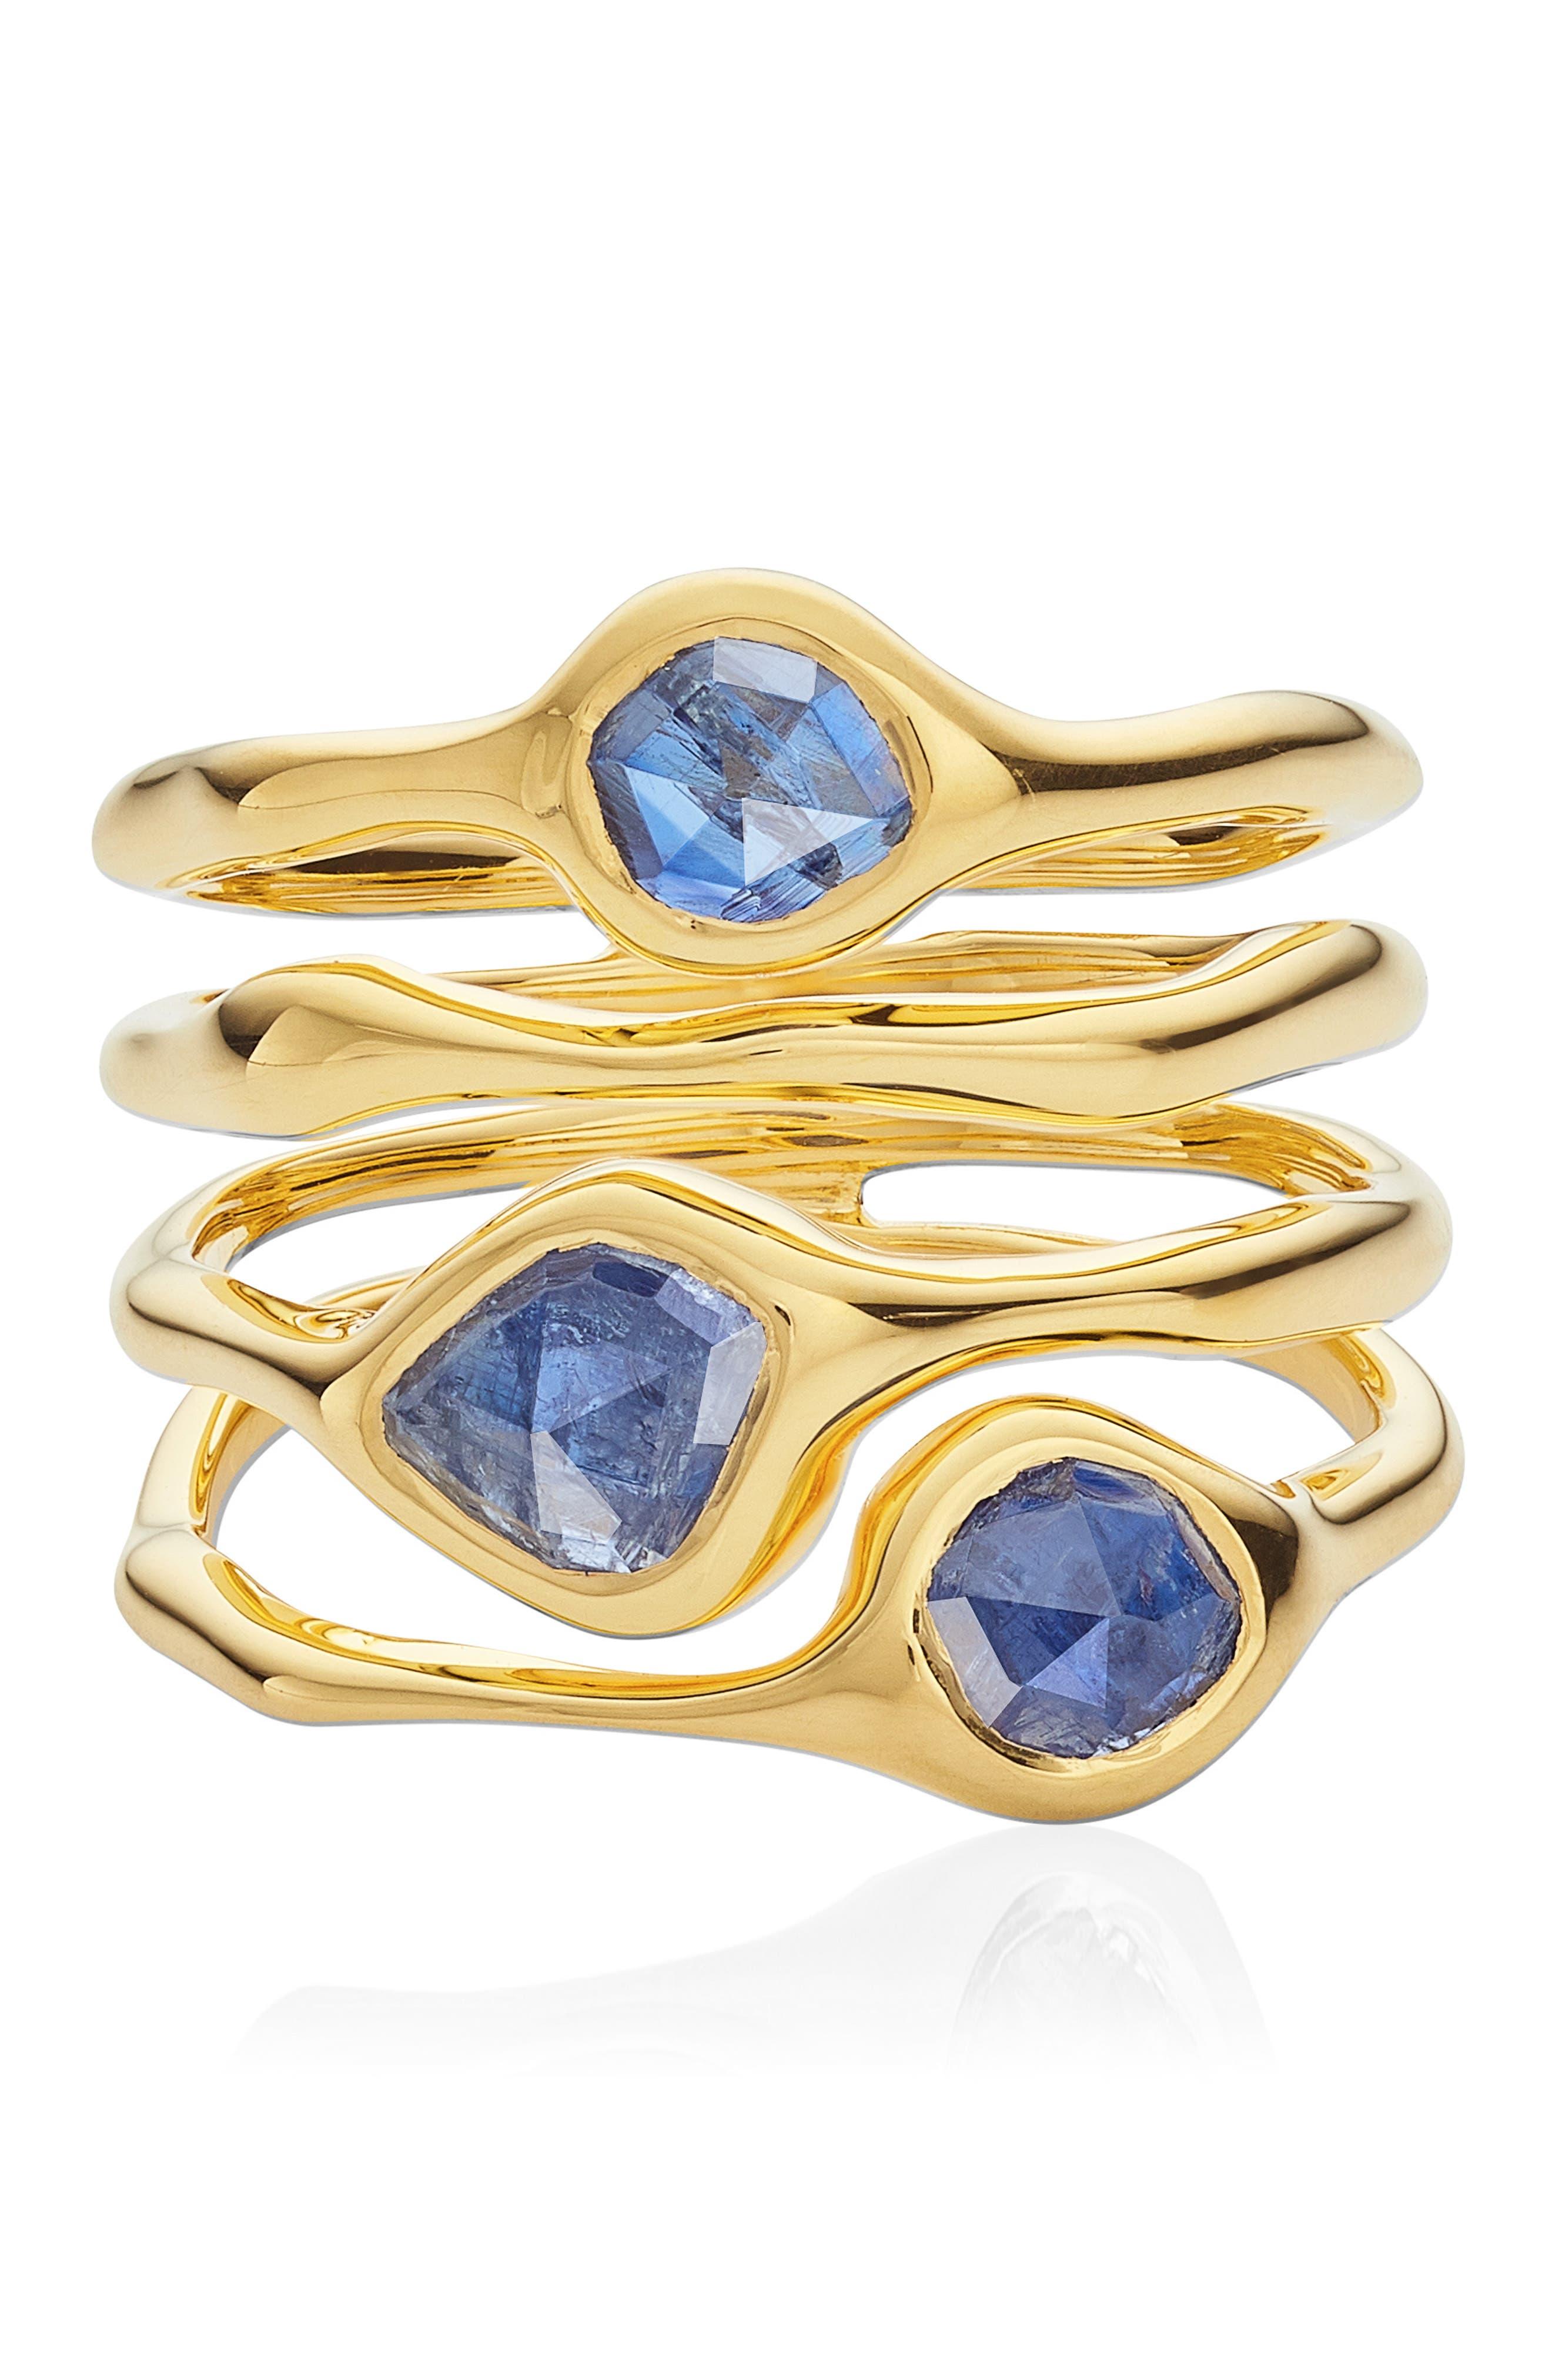 Siren Cluster Cocktail Ring,                             Alternate thumbnail 3, color,                             GOLD/ KYANITE